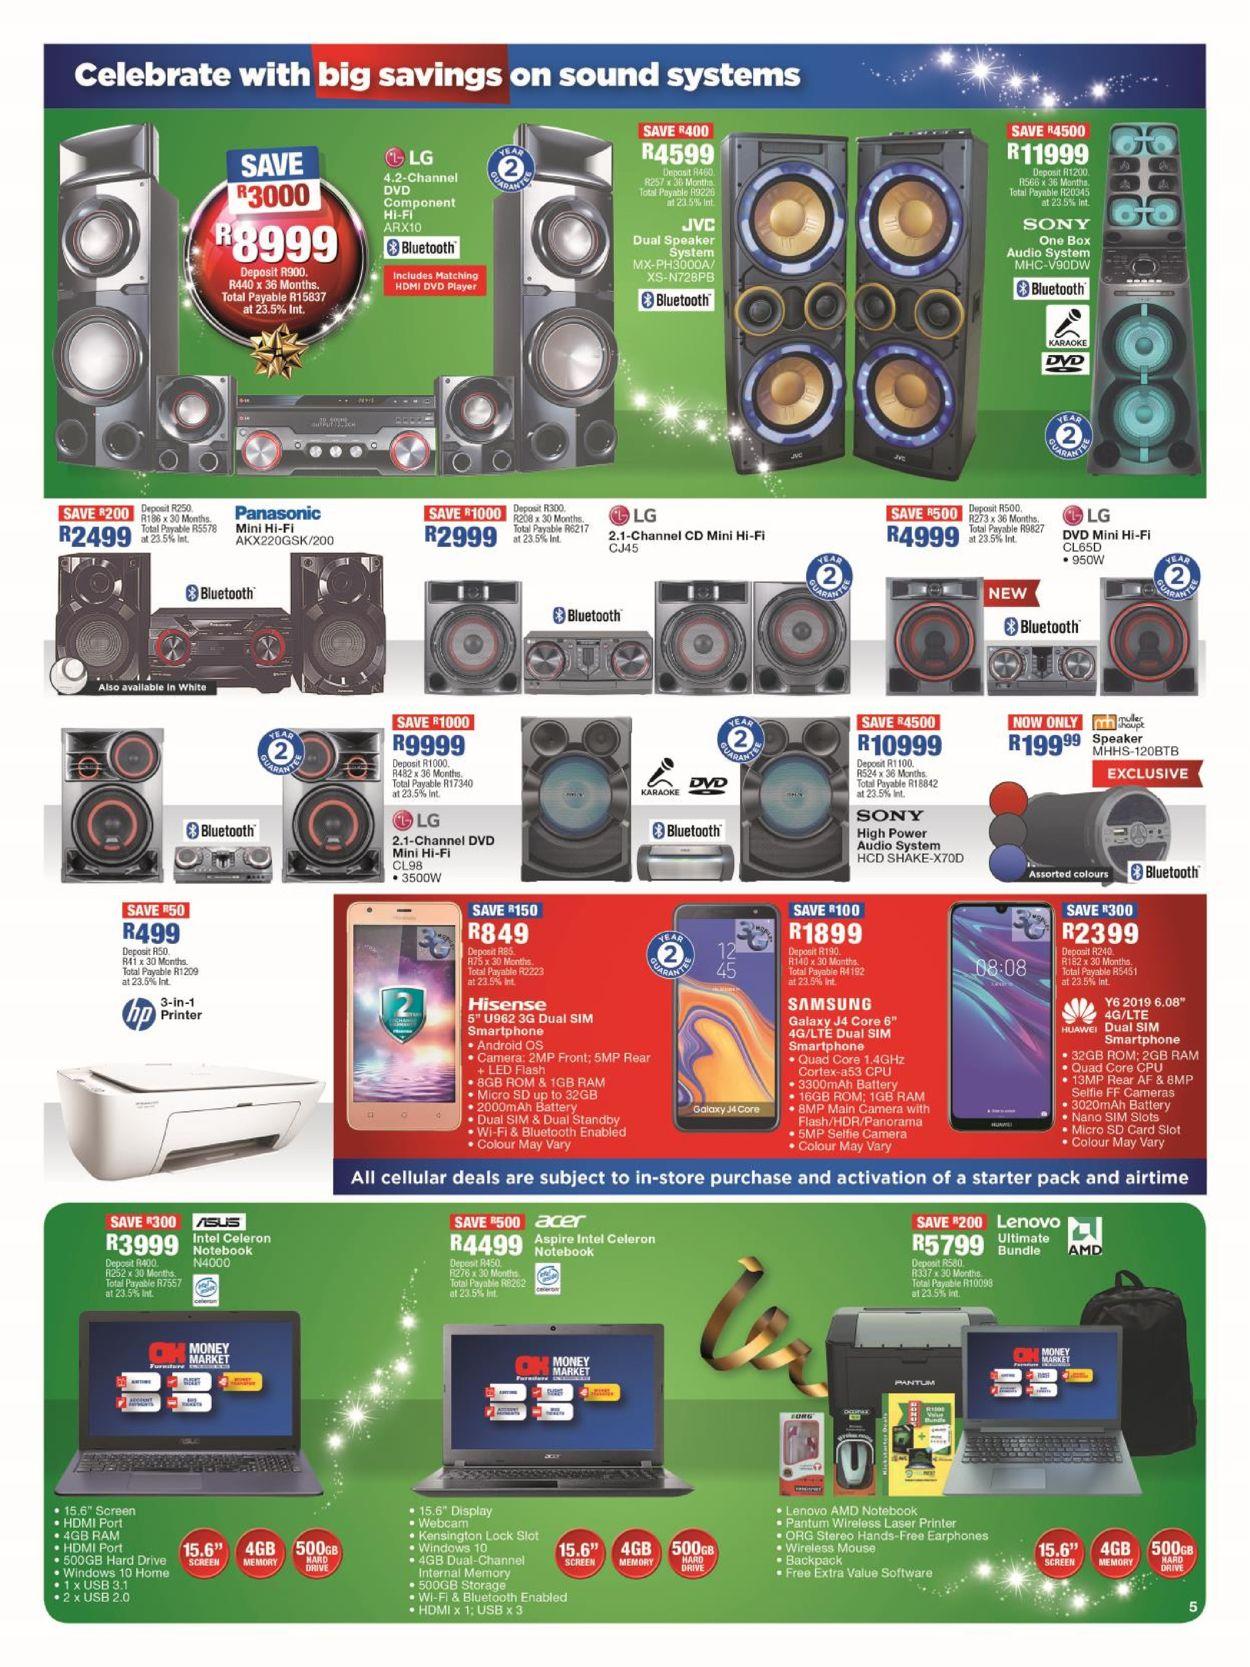 OK Furniture Christmas Catalogue 2019 Catalogue - 2019/12/10-2019/12/22 (Page 5)